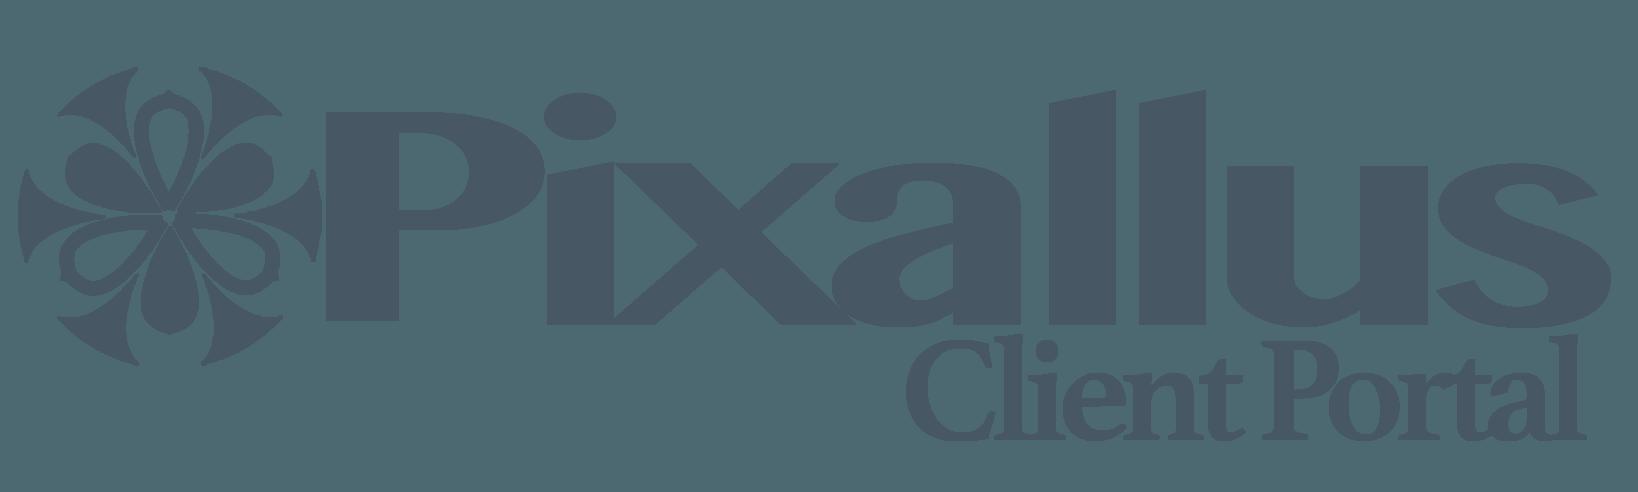 2018-Pixallus-Logo-client-portal-dark